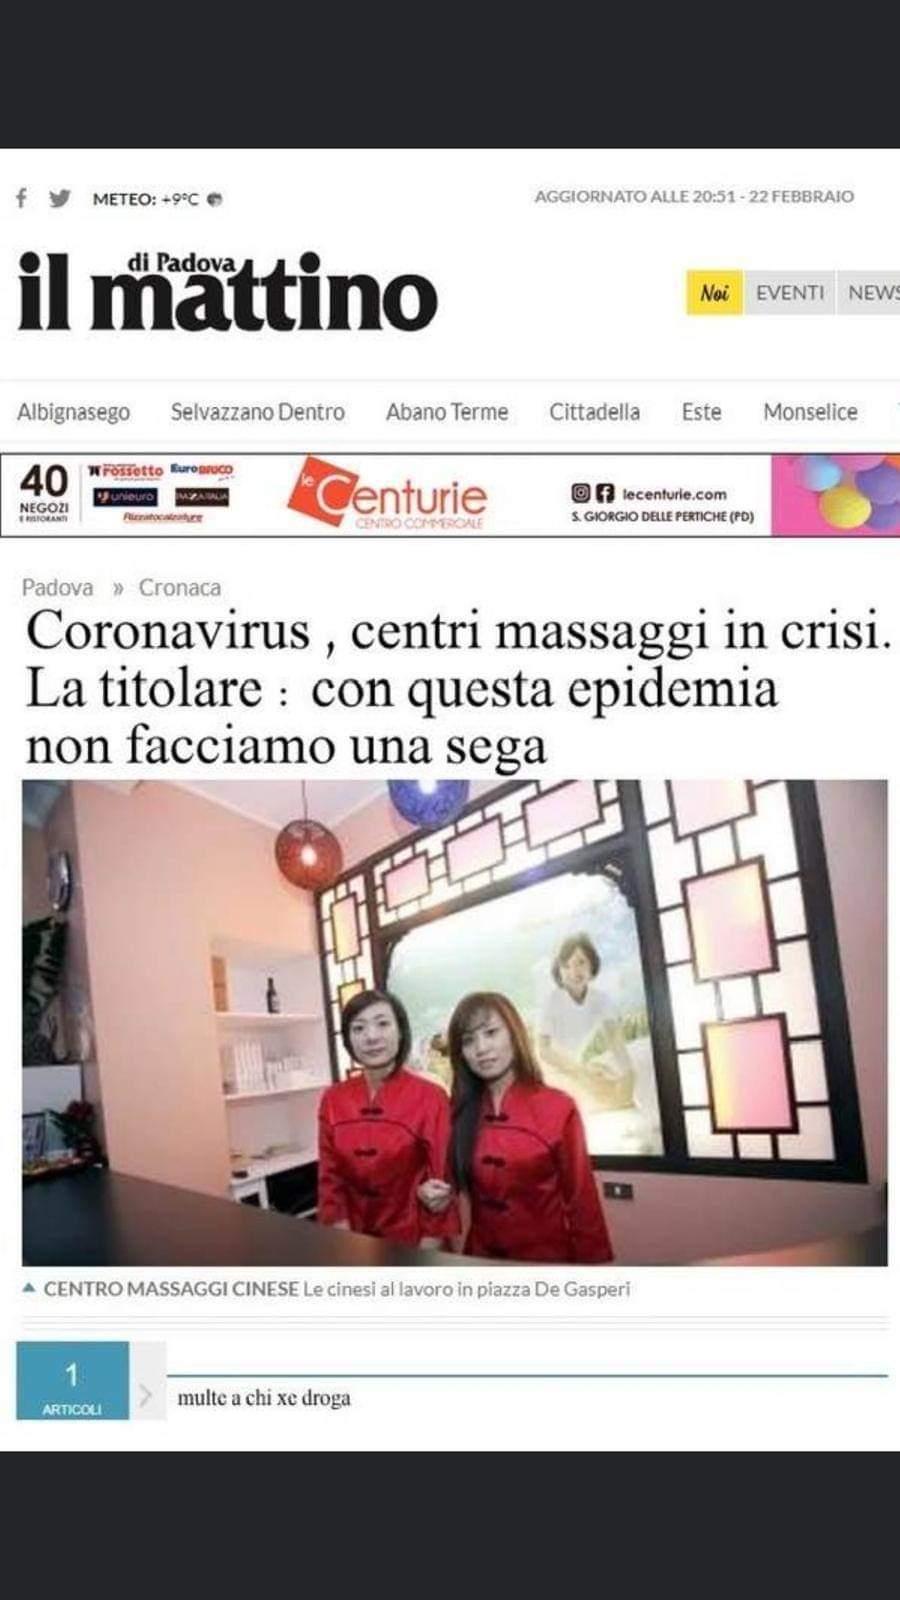 Centro massaggi cinese